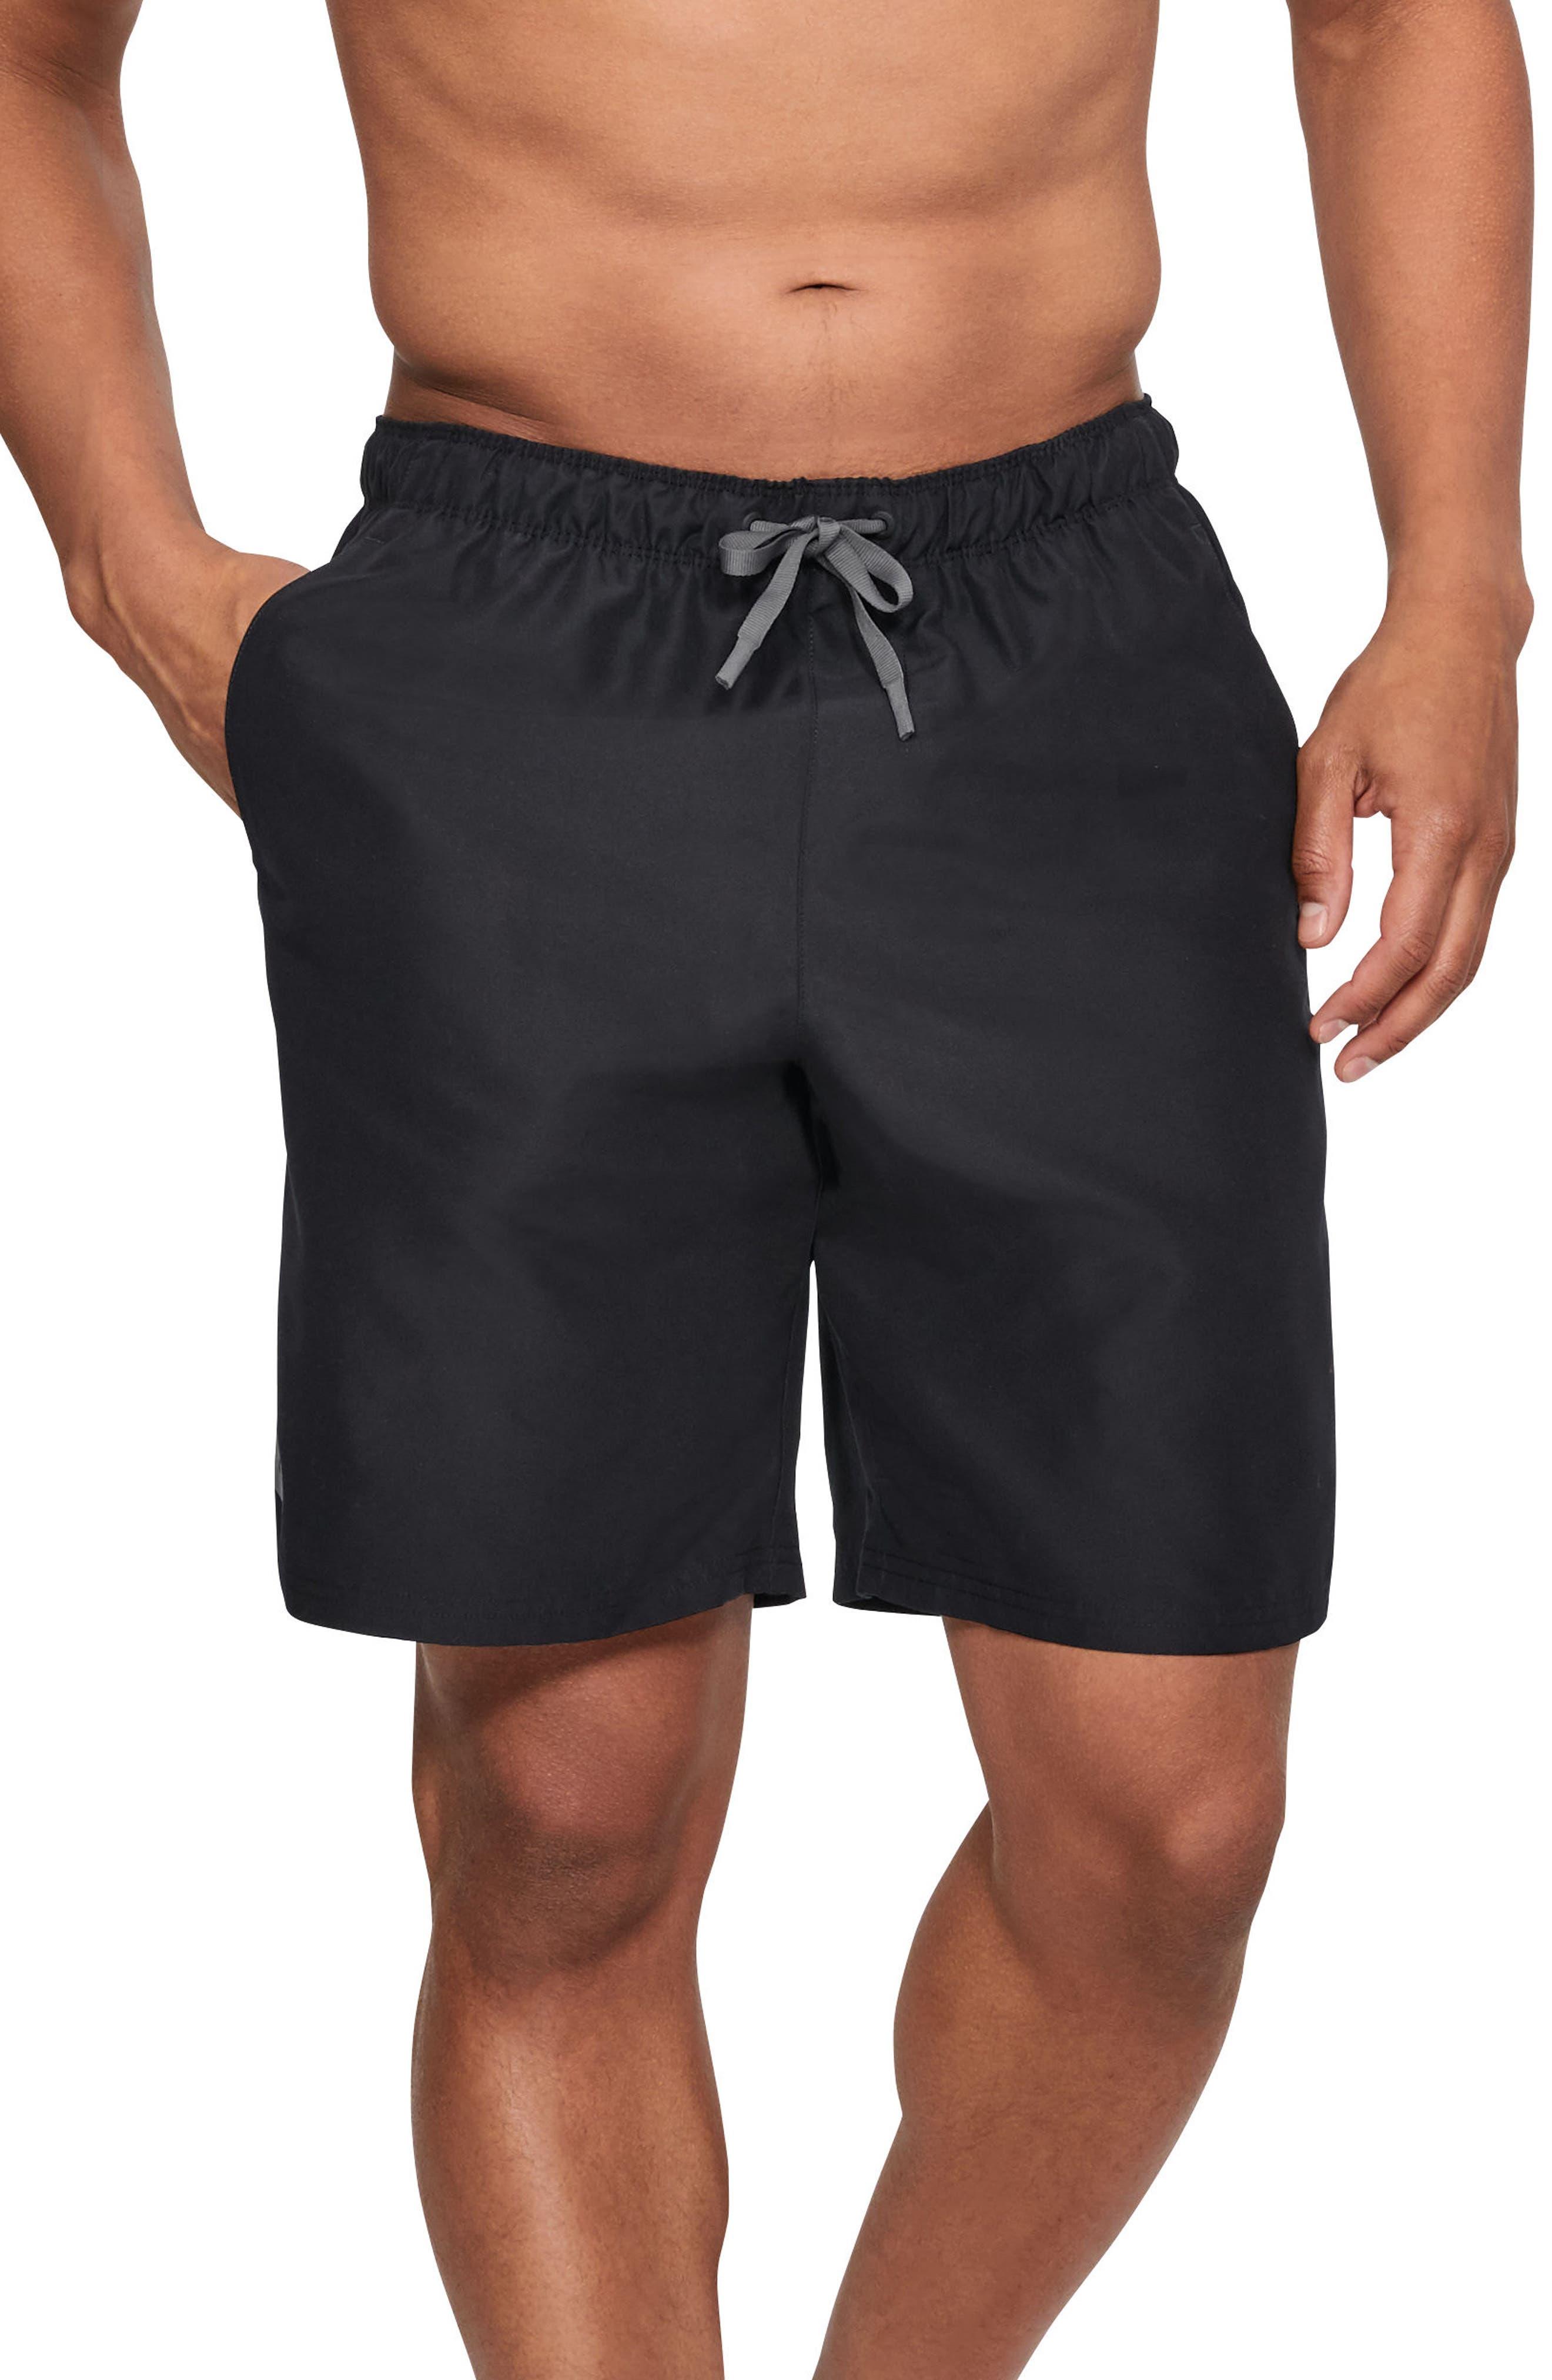 Mania Athletic Shorts,                         Main,                         color, 001